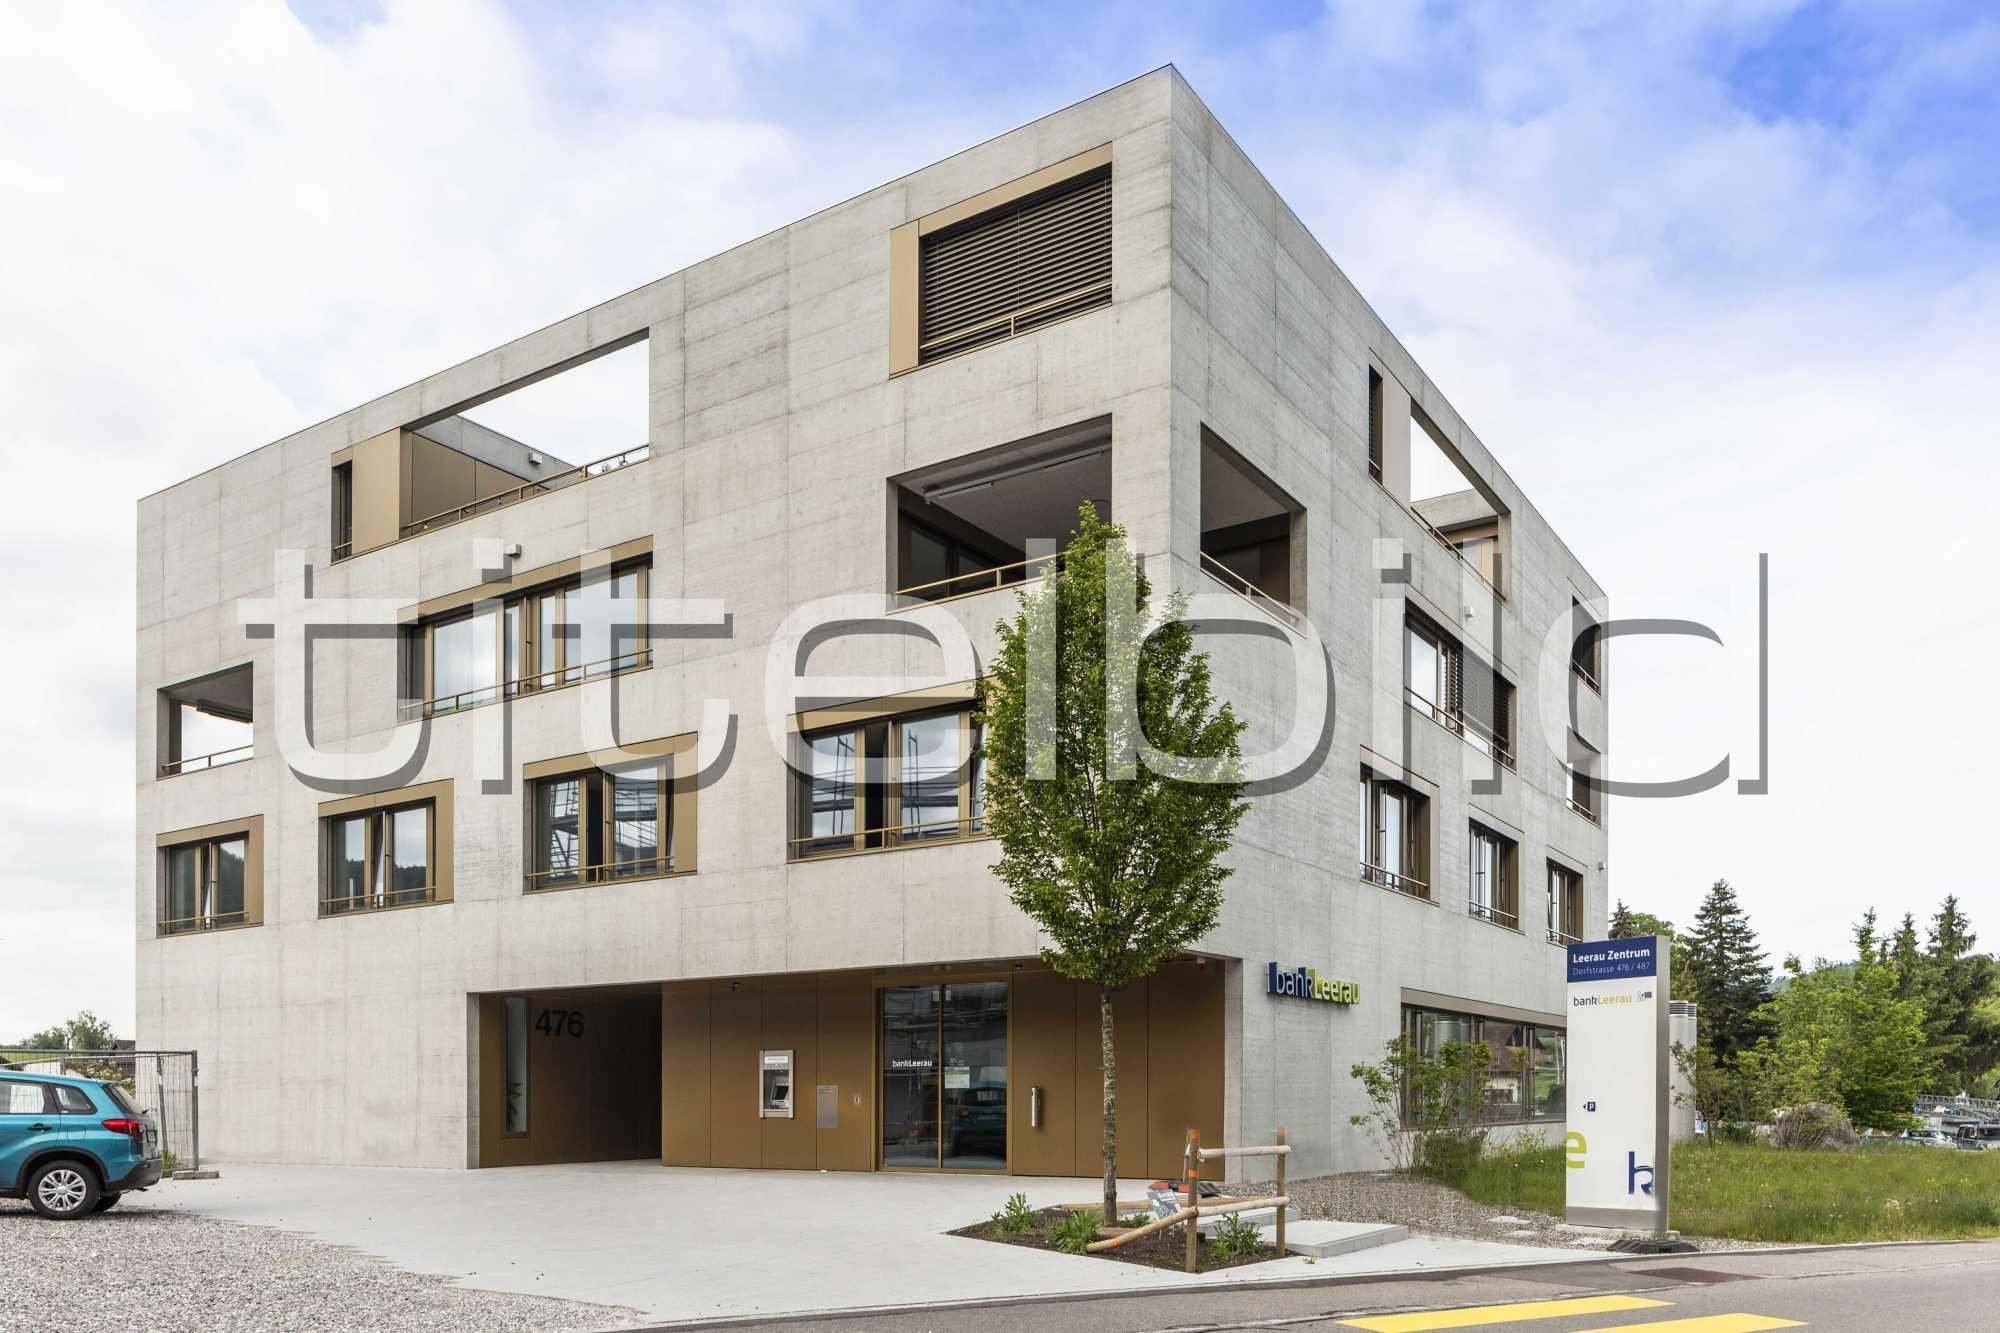 Projektbild-Nr. 2: Bank Leerau, Zentrum-Haus A, Kirchleerau